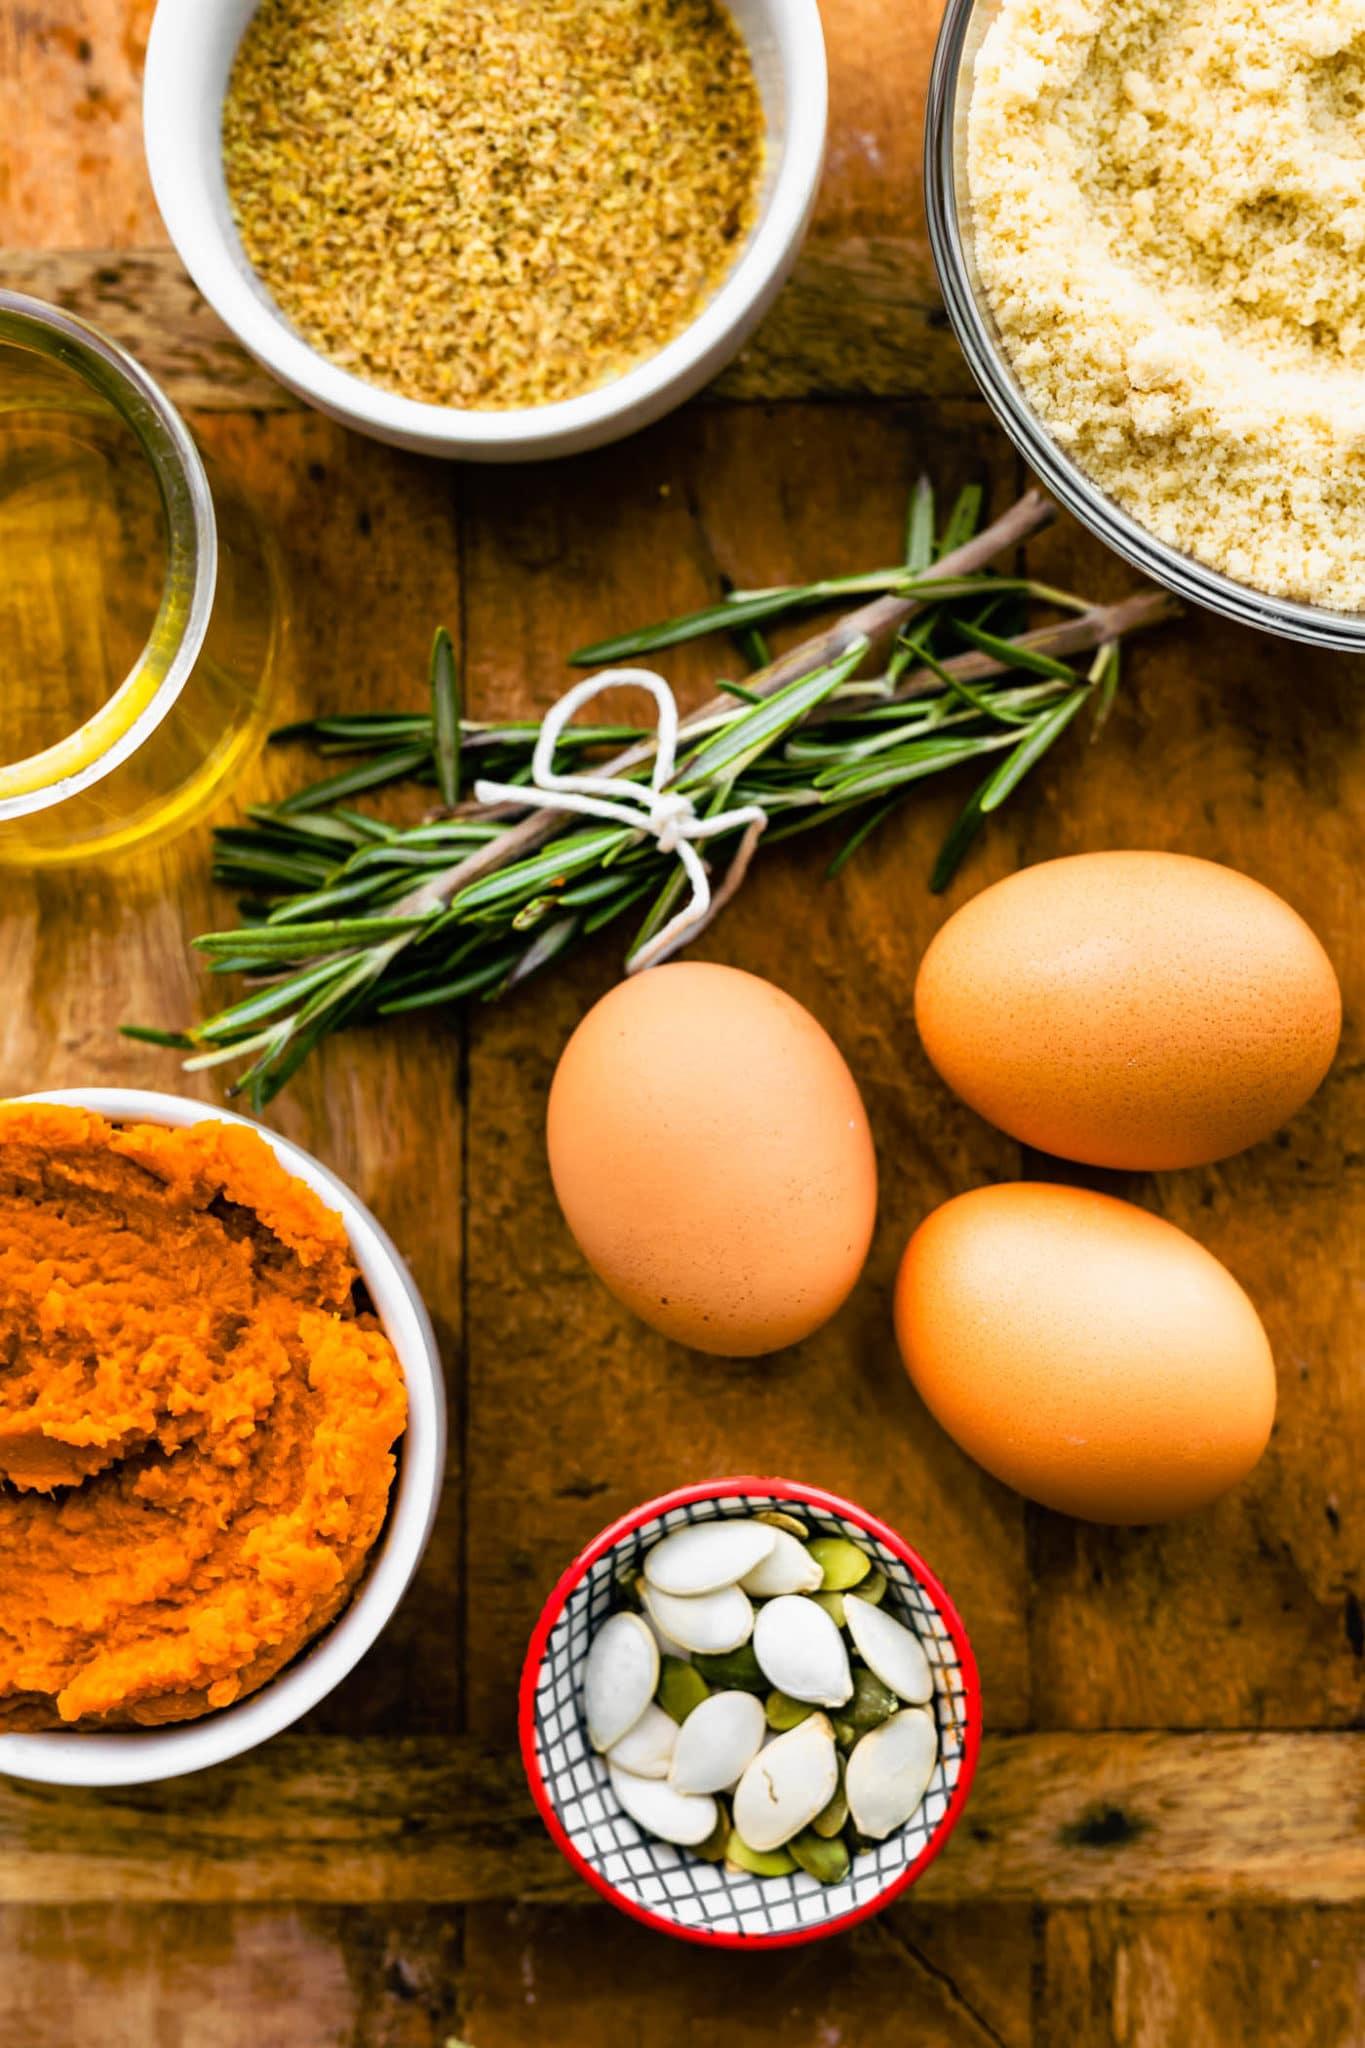 ingredients for paleo pumpkin rosemary bread